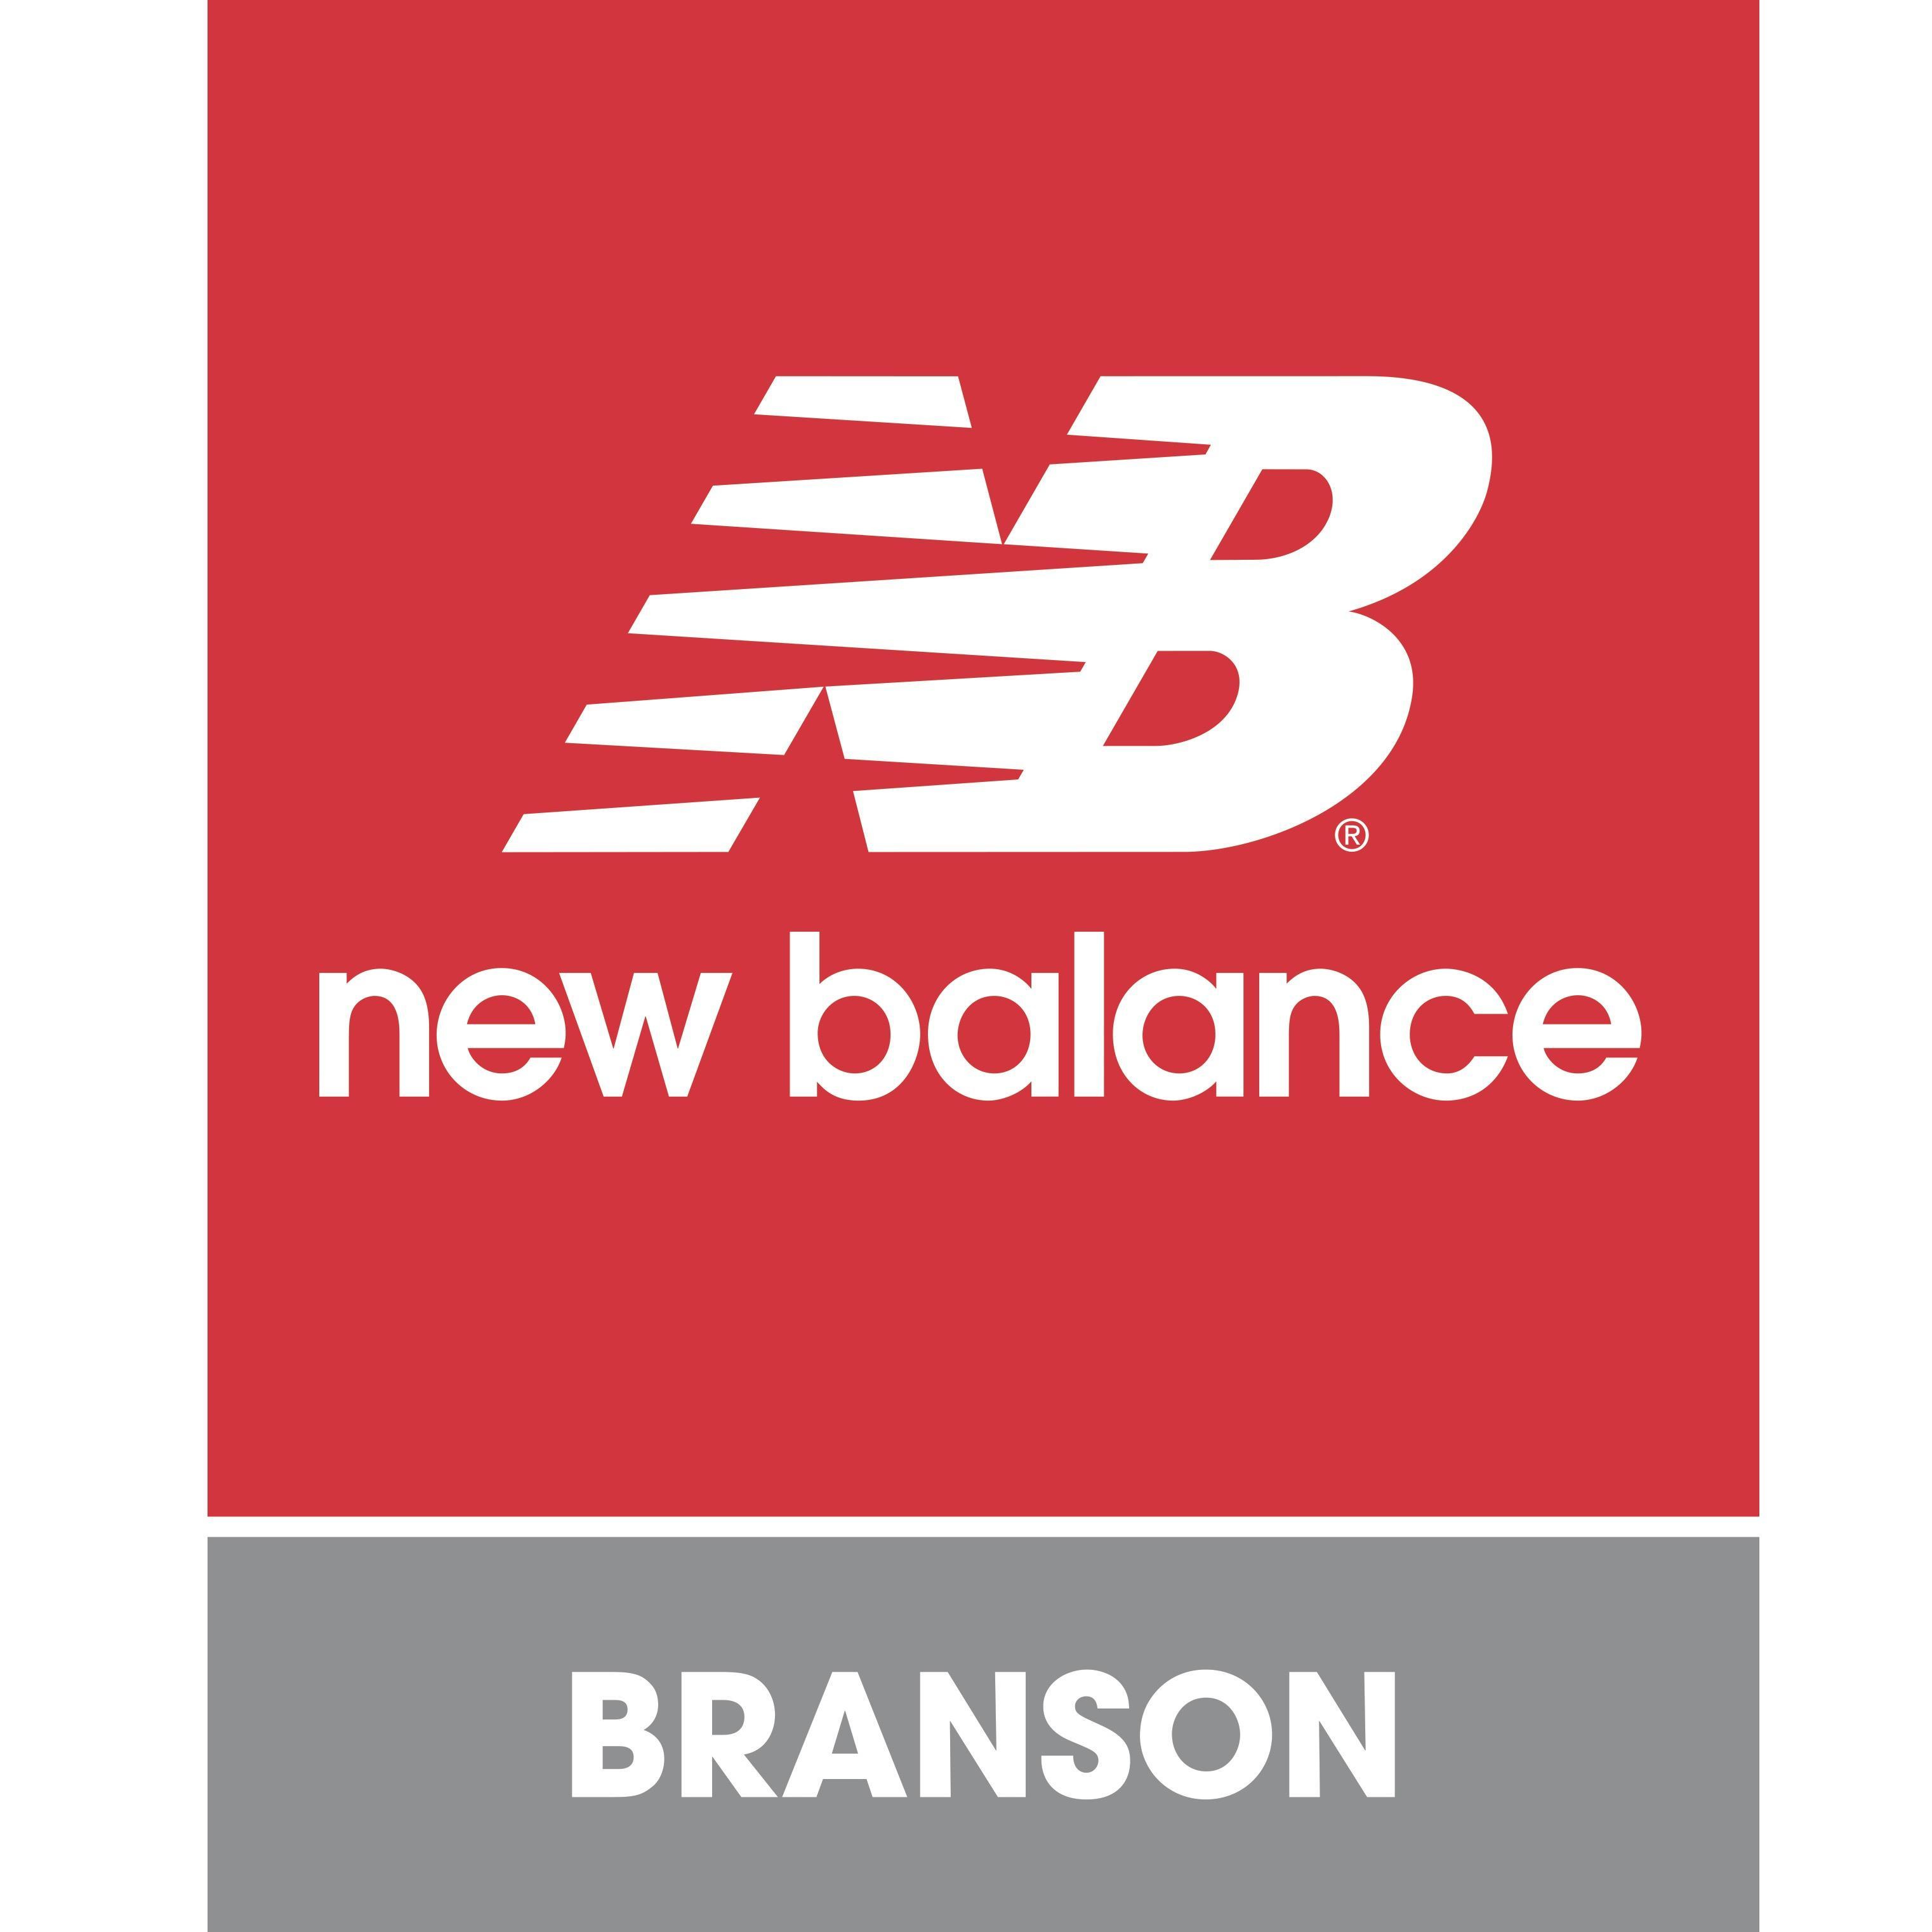 New Balance Branson image 6